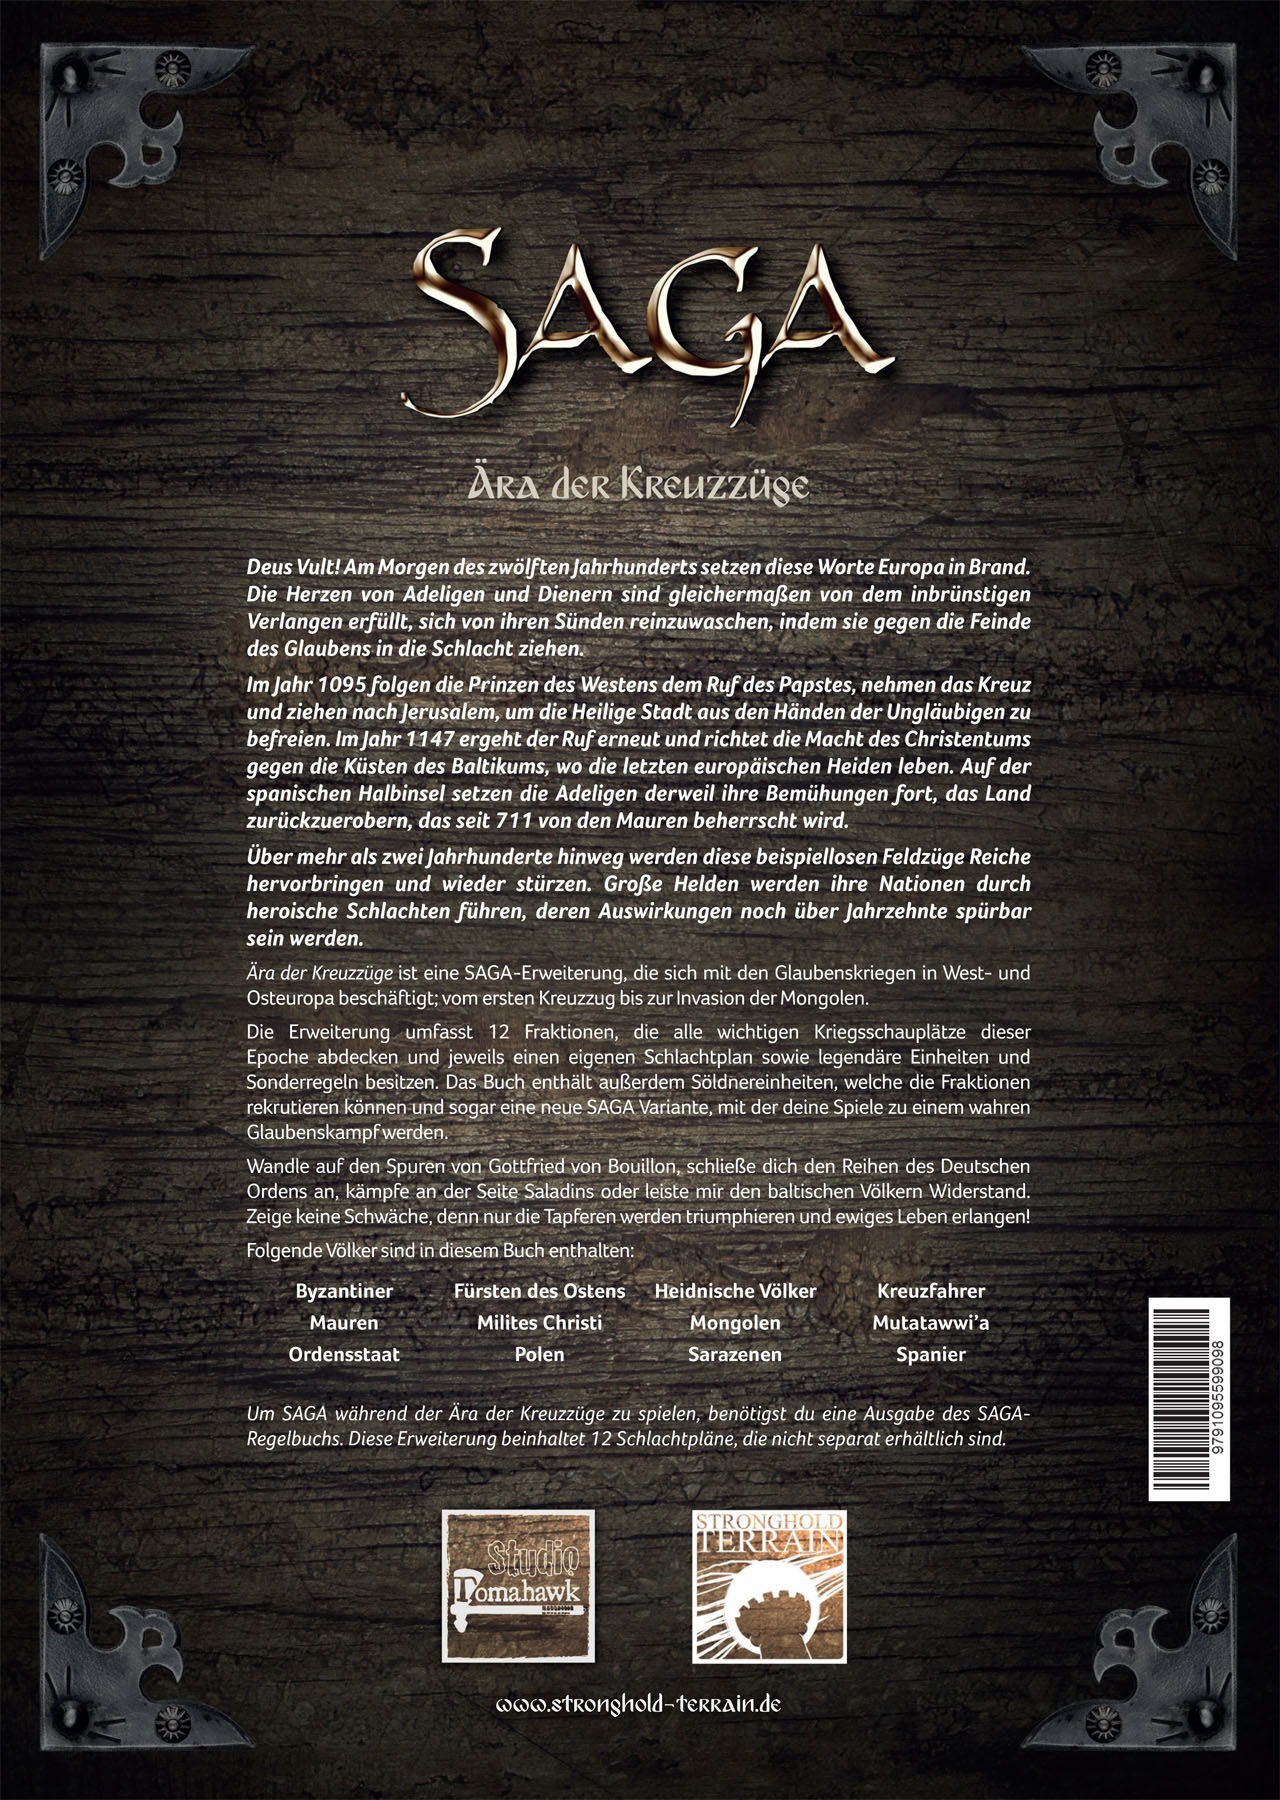 SAGA-Aera-der-Kreuzzuege-Backcover.jpg